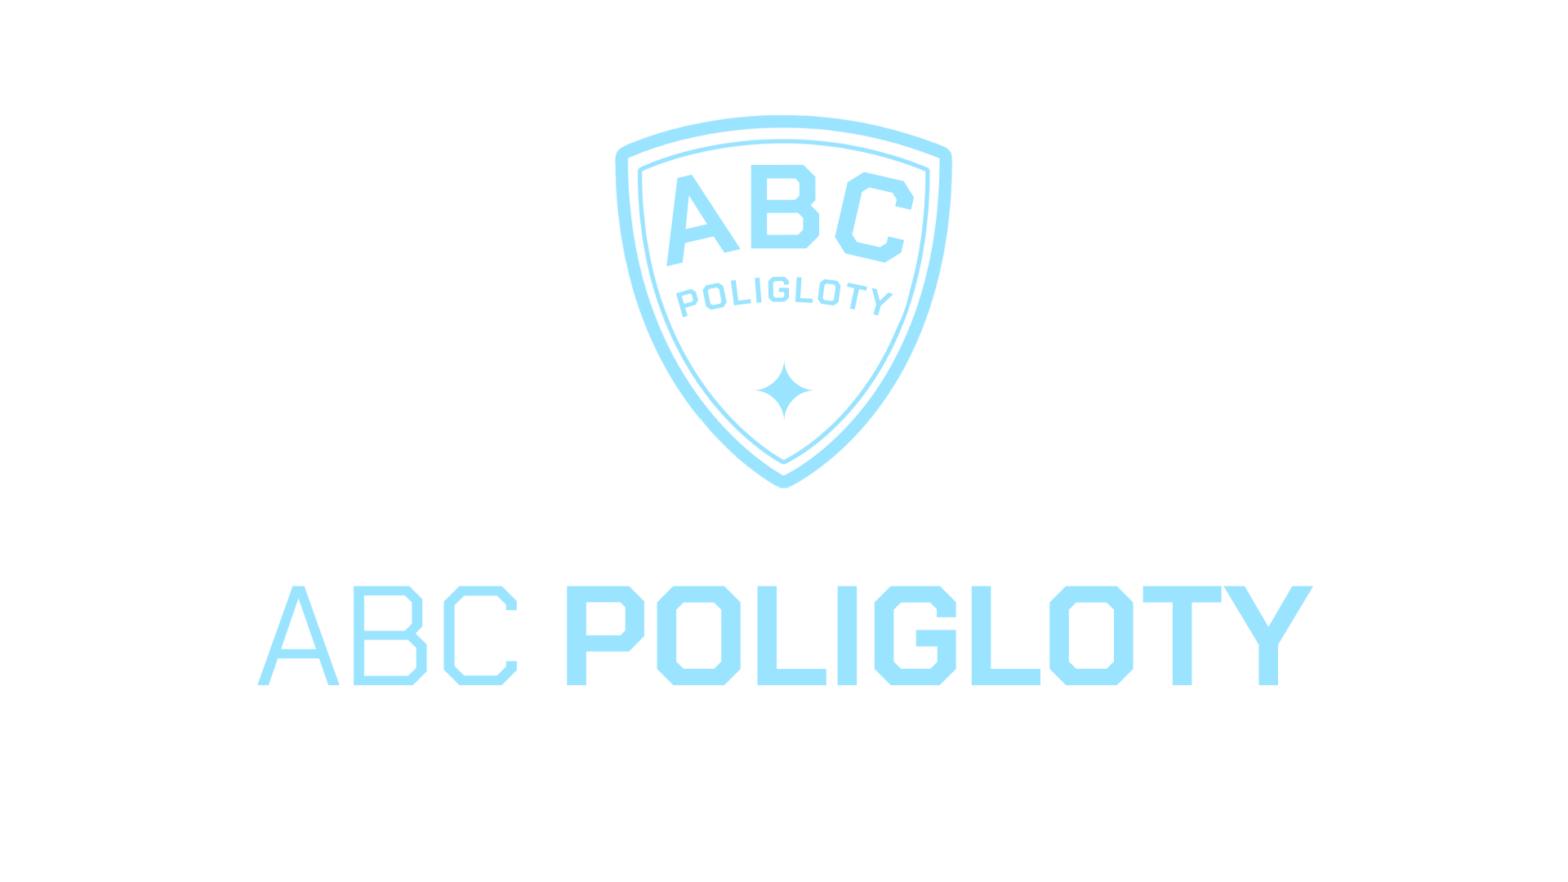 ABC Poligloty